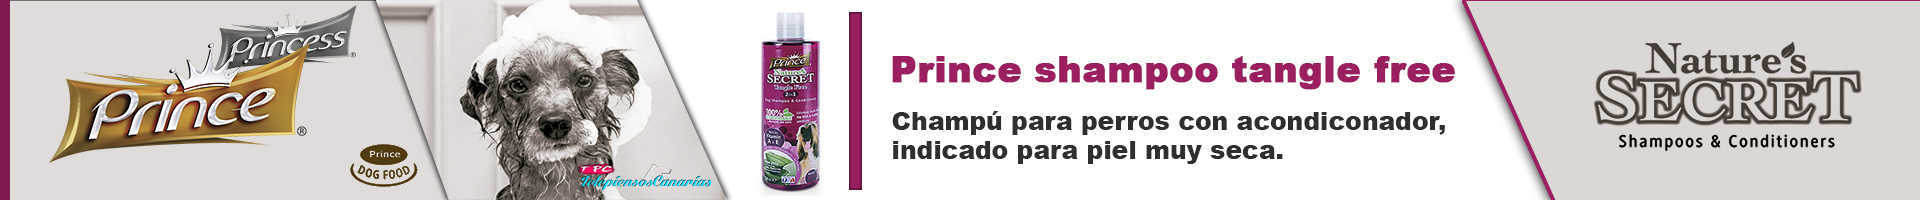 Prince champú con acondicionador para perros con camomila